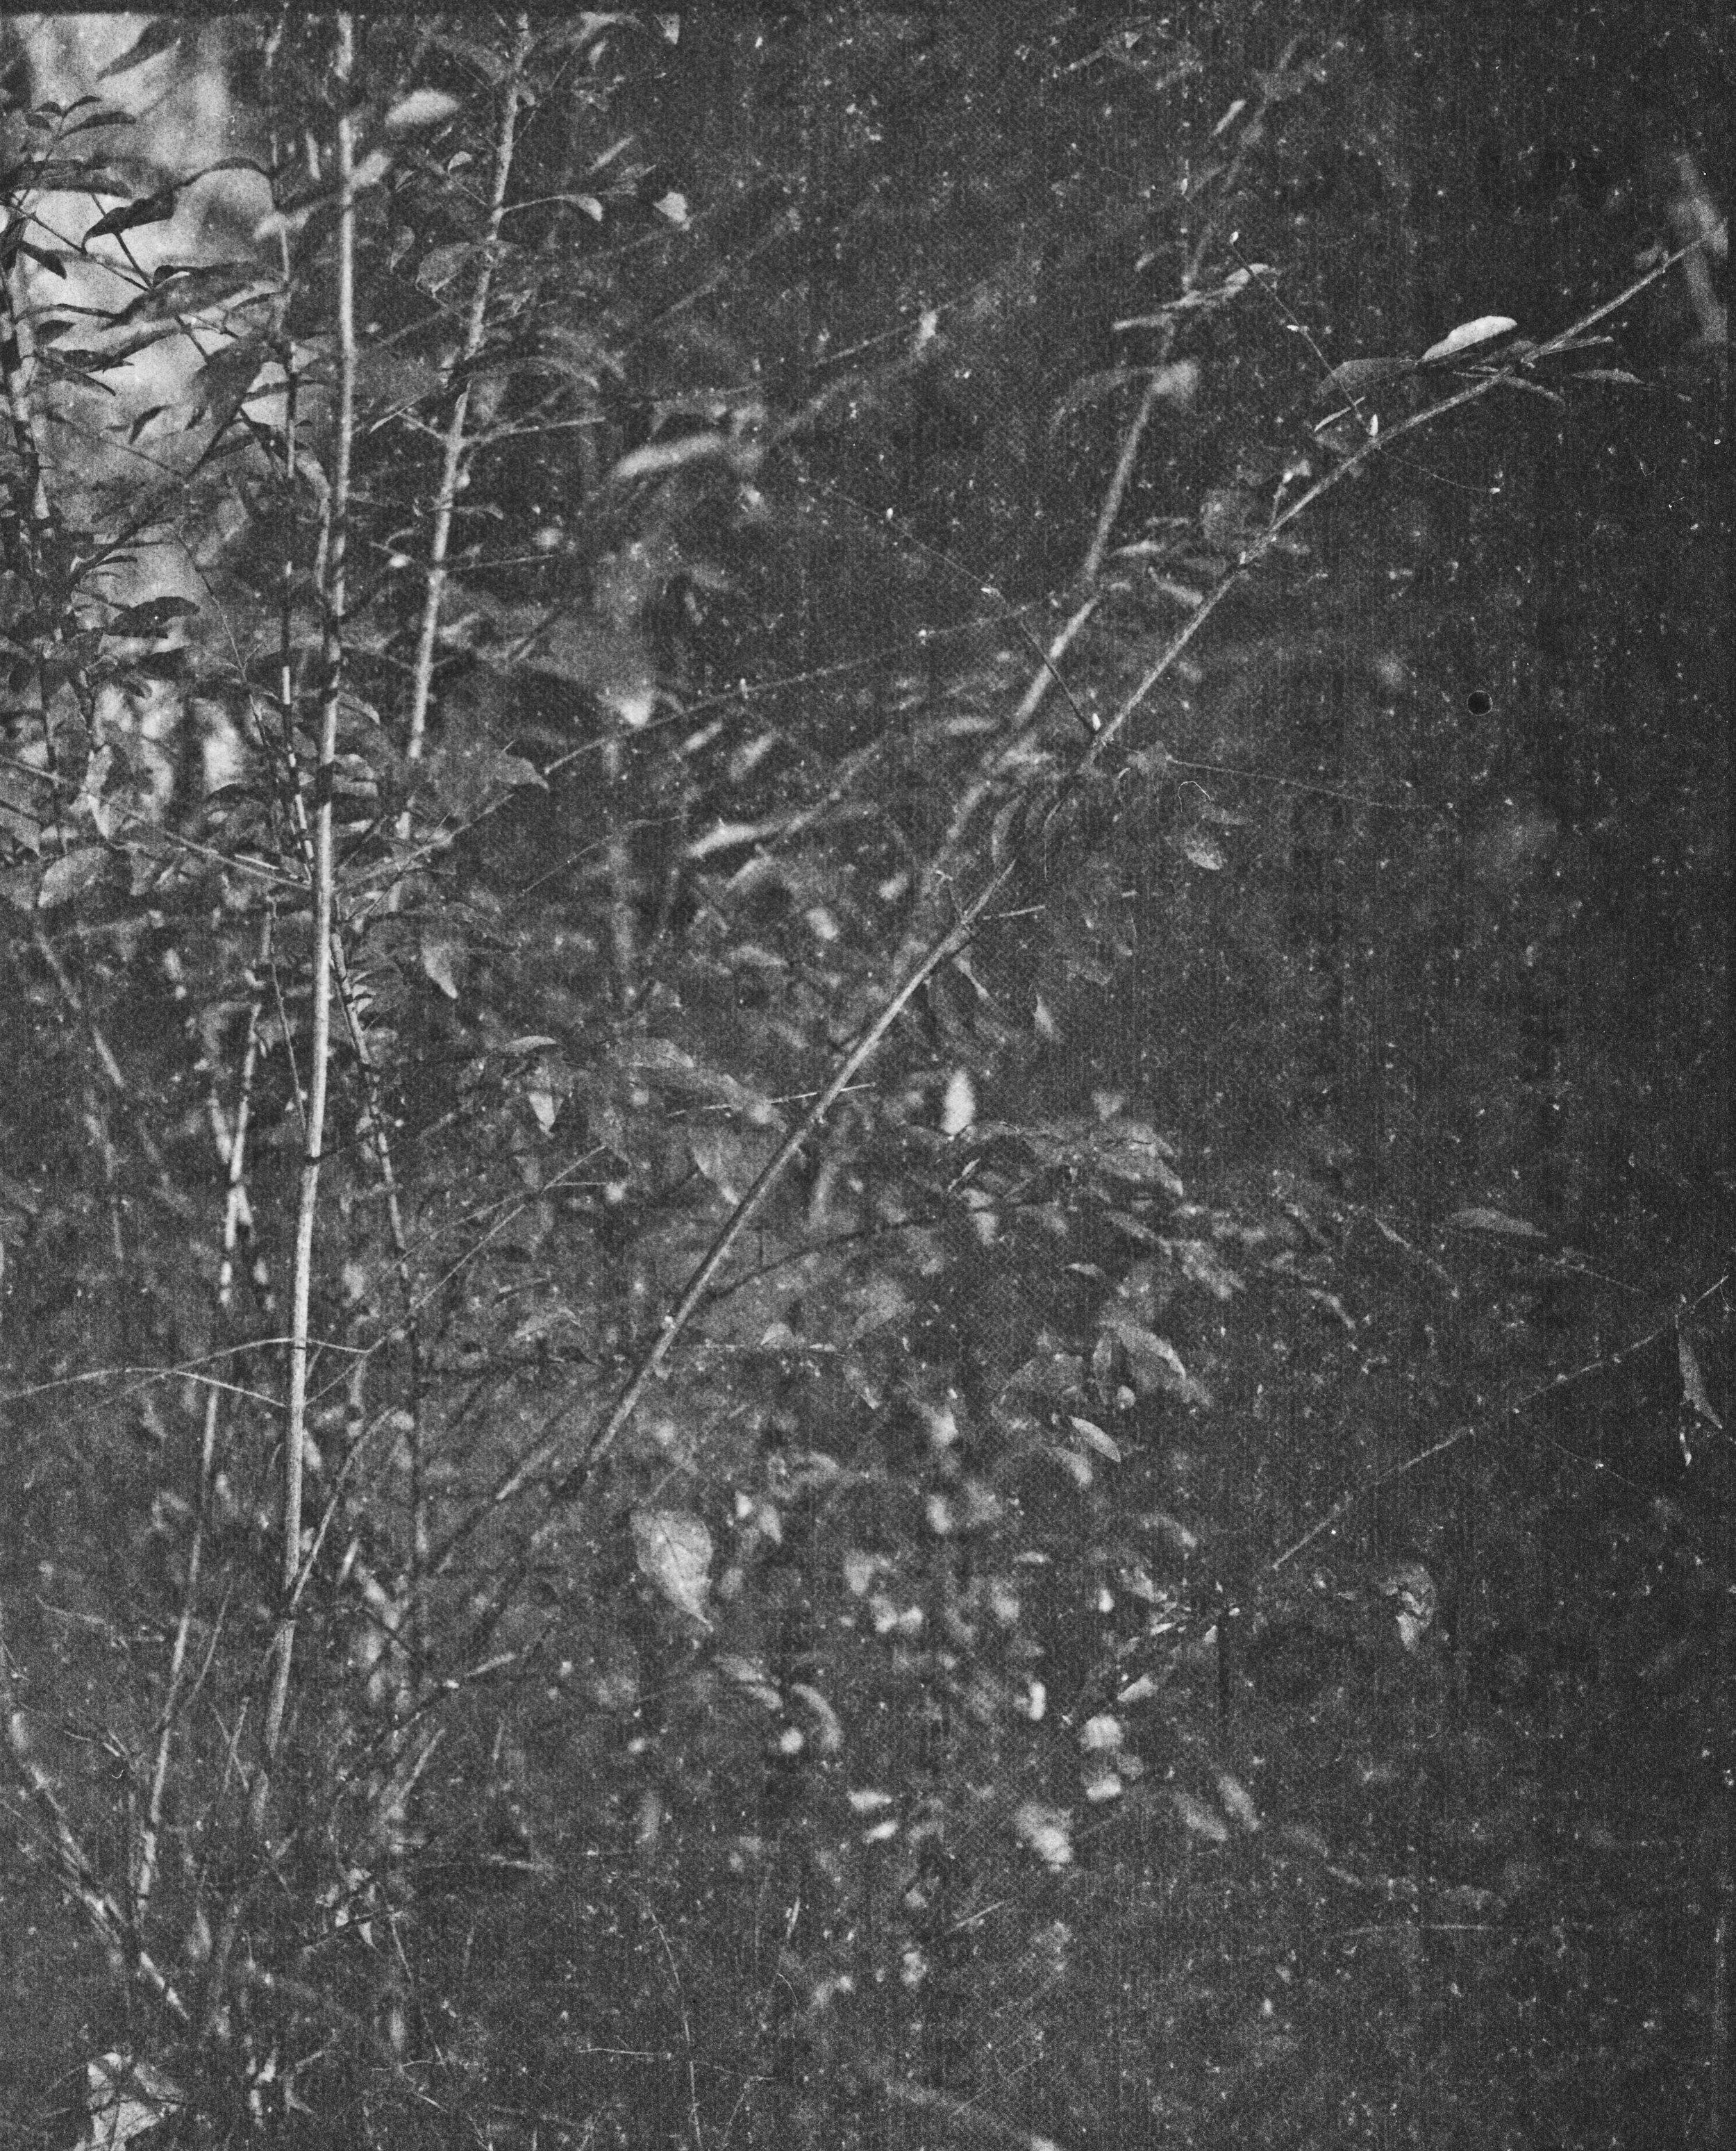 lydiasee-creekoffspringdale2014-color120mm-batch142.JPG